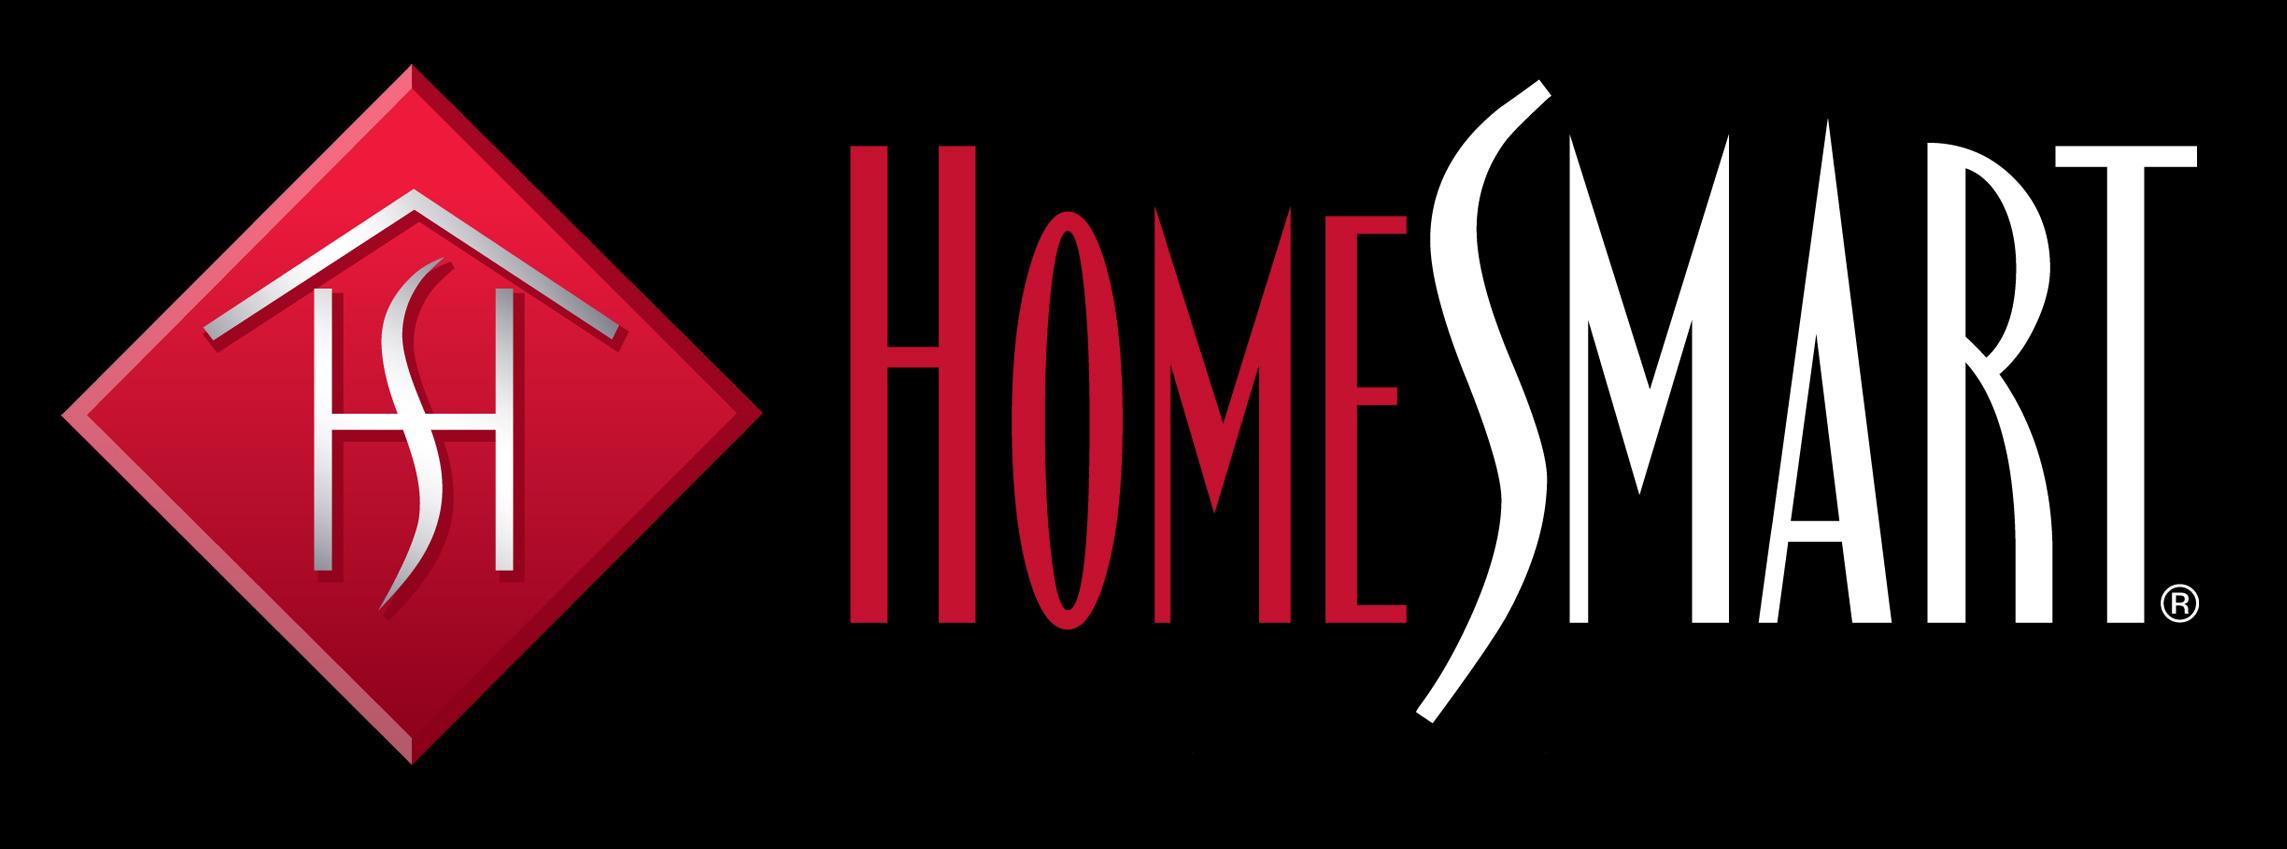 Homesmart Logos.